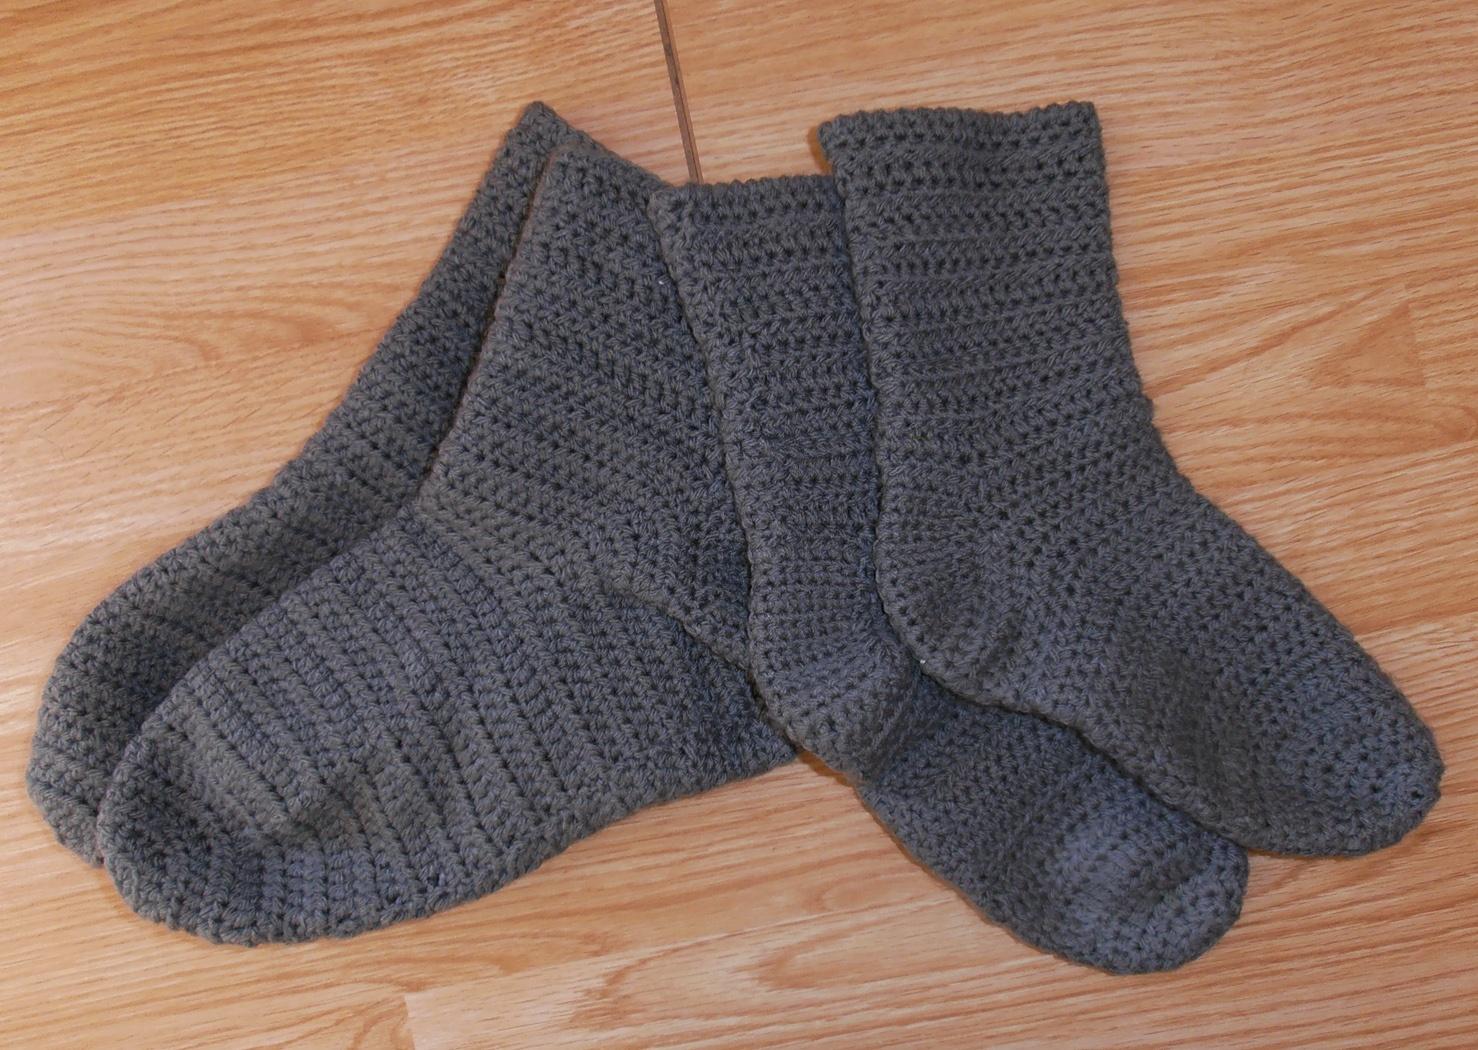 chaussette homme crochet. Black Bedroom Furniture Sets. Home Design Ideas